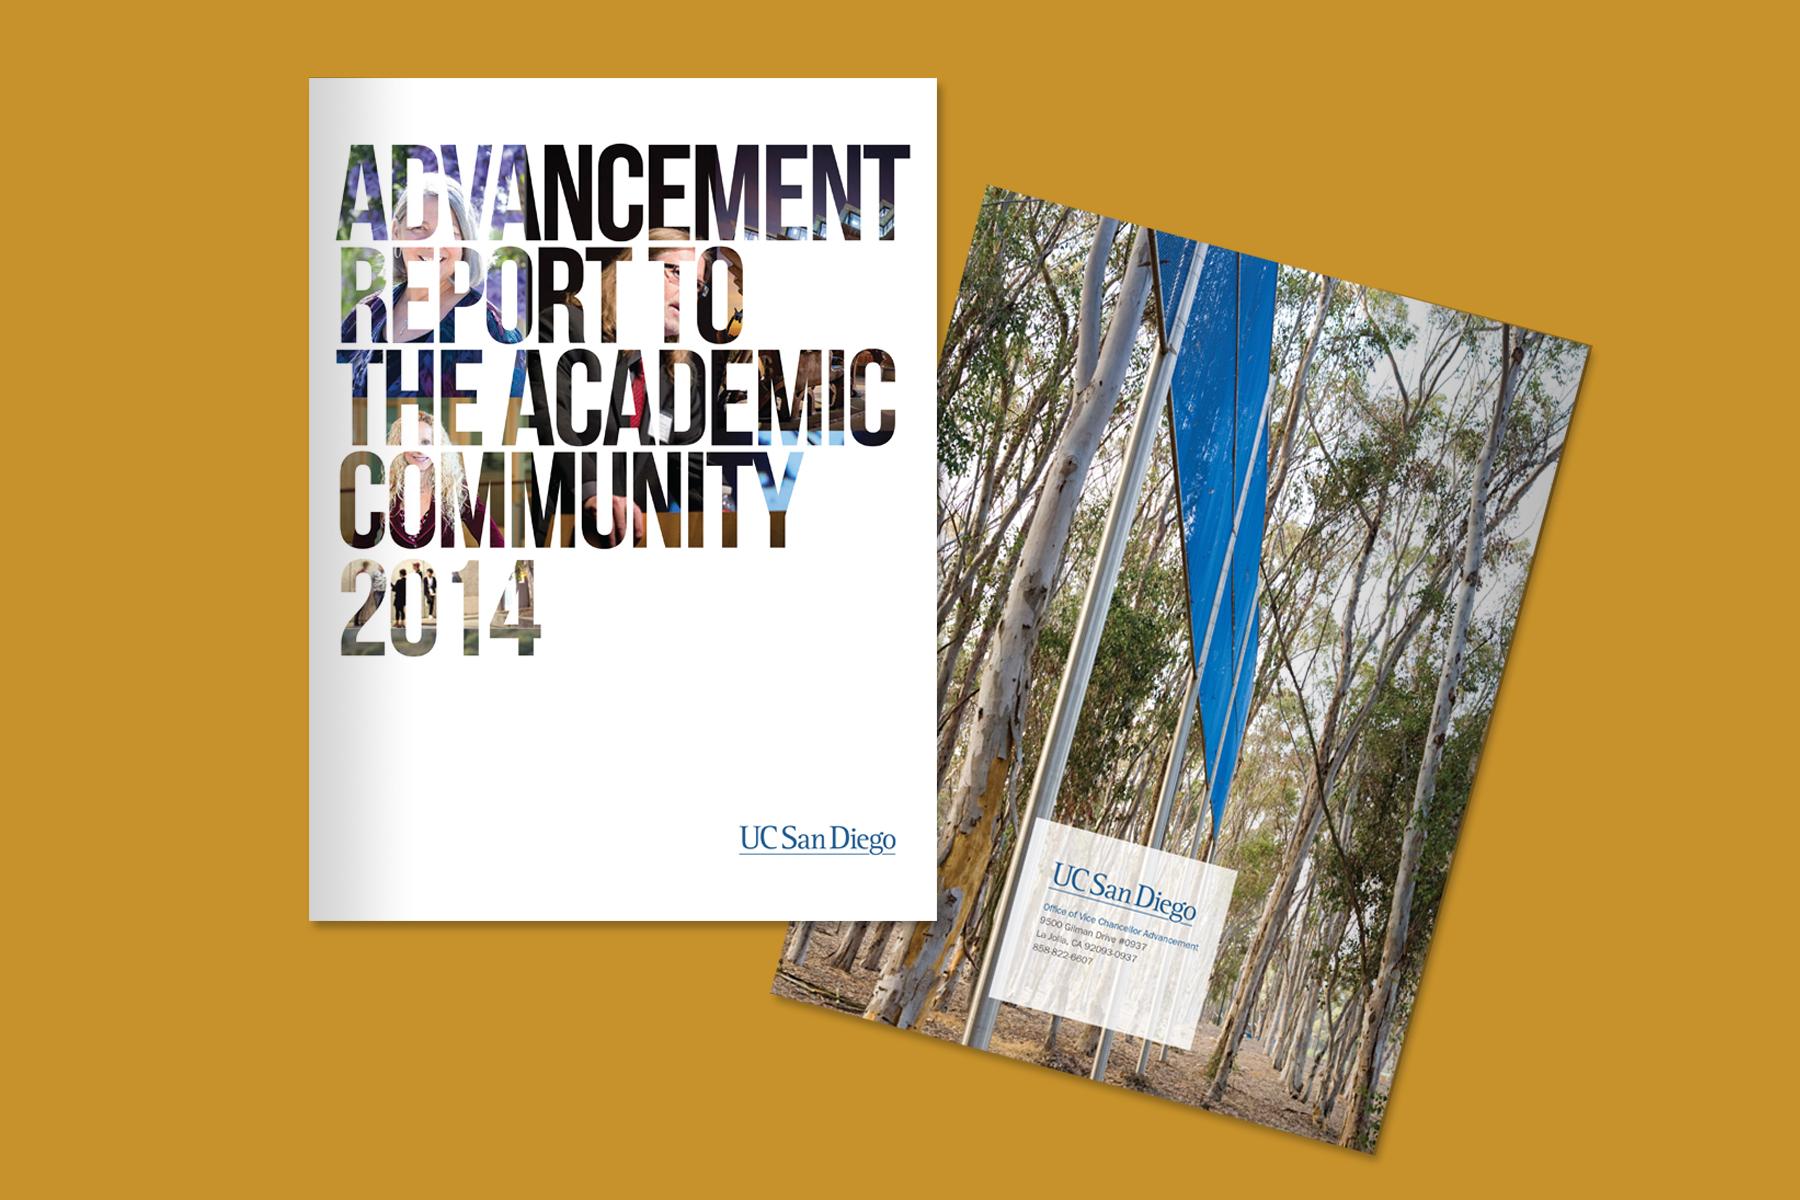 Academic Report Covers_web1.jpg